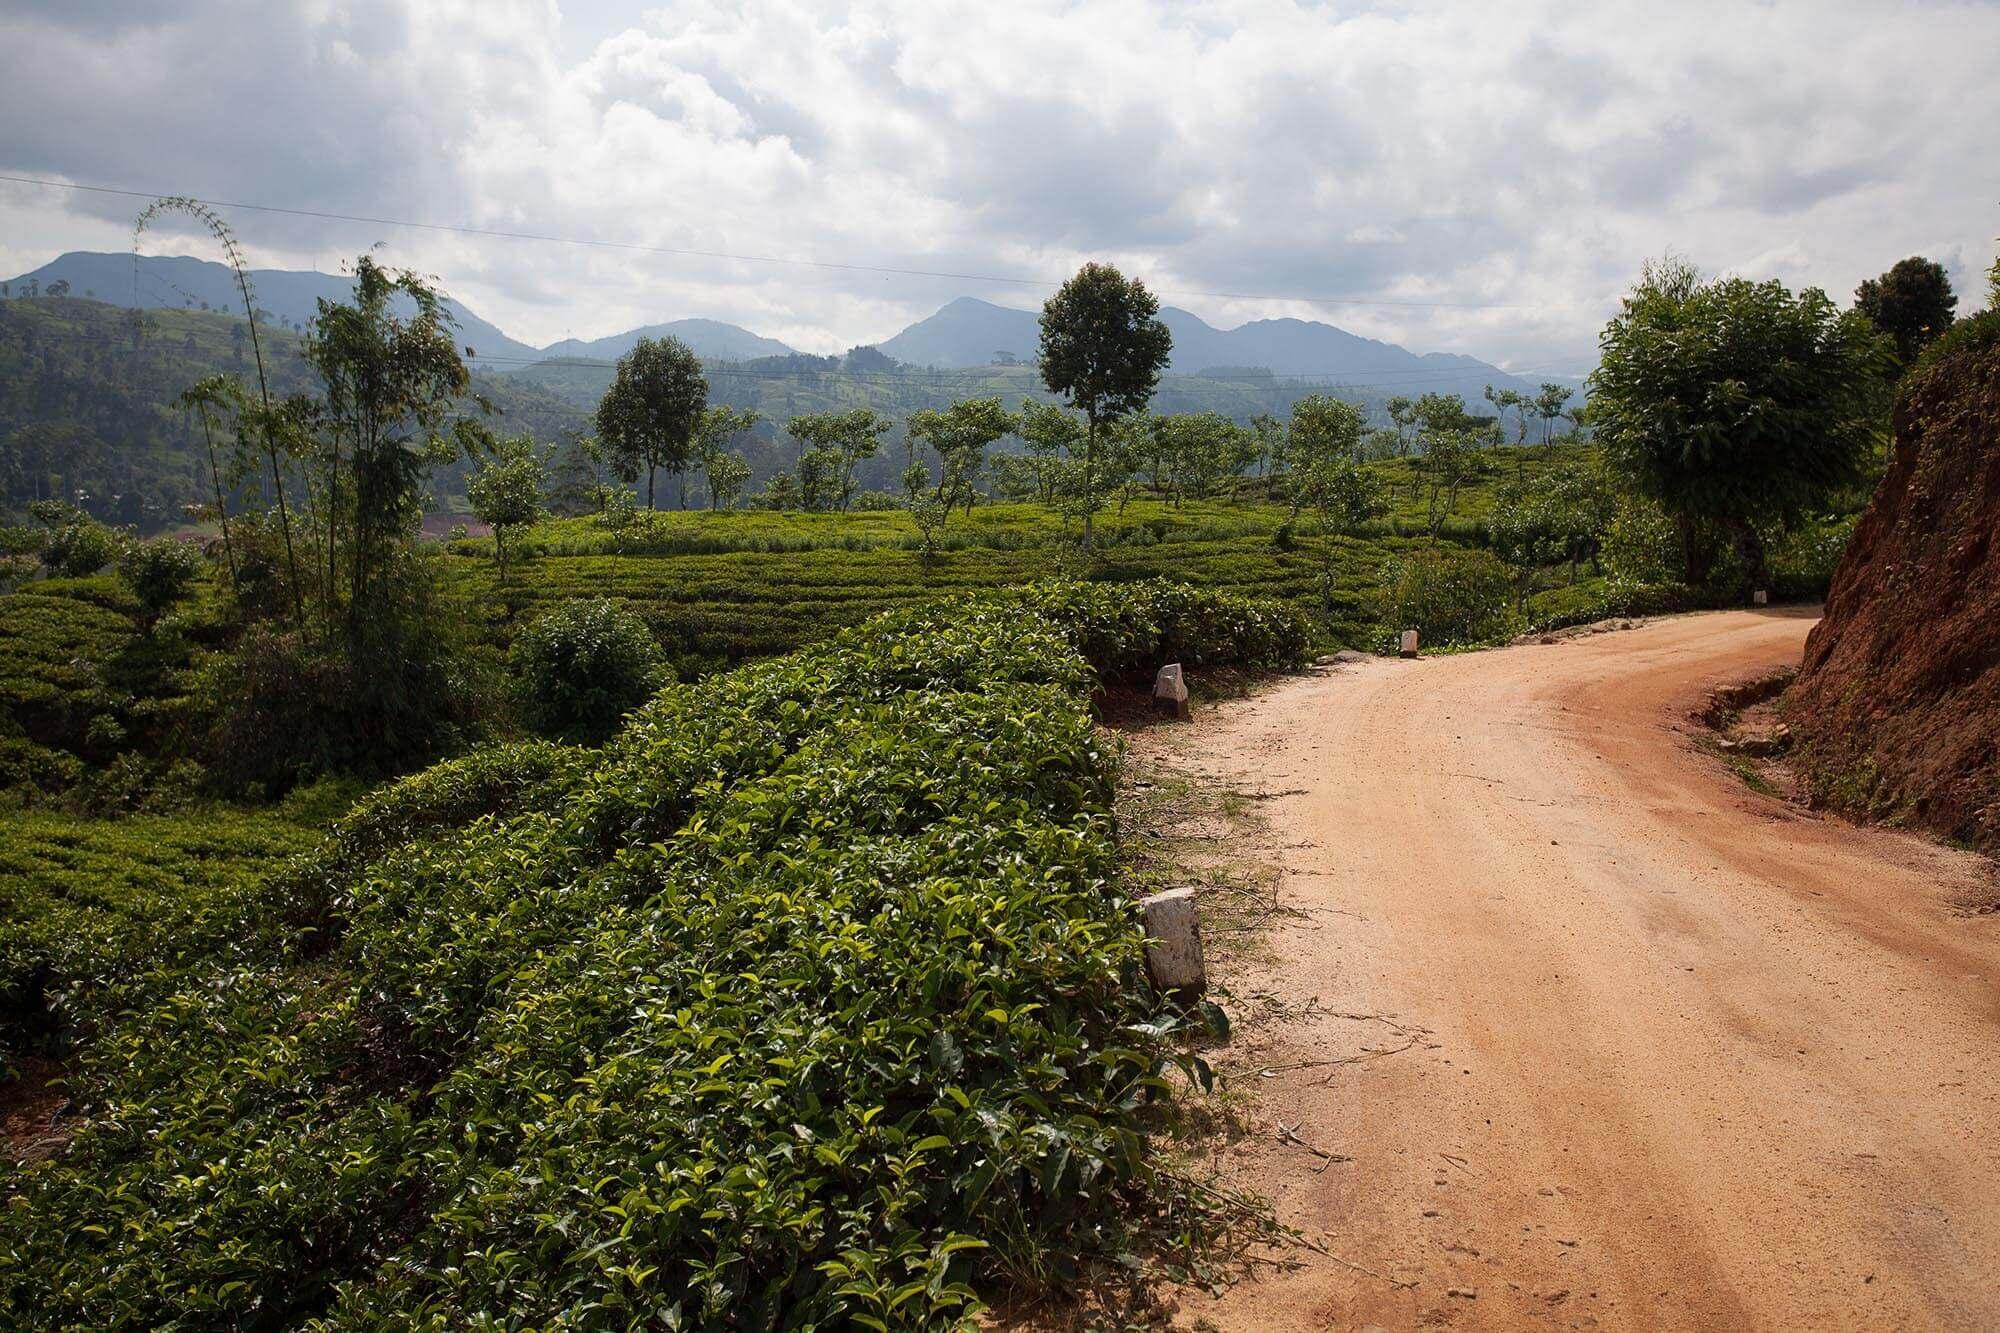 Wjazd na plantację herbaty Dunkeld na Sri Lance